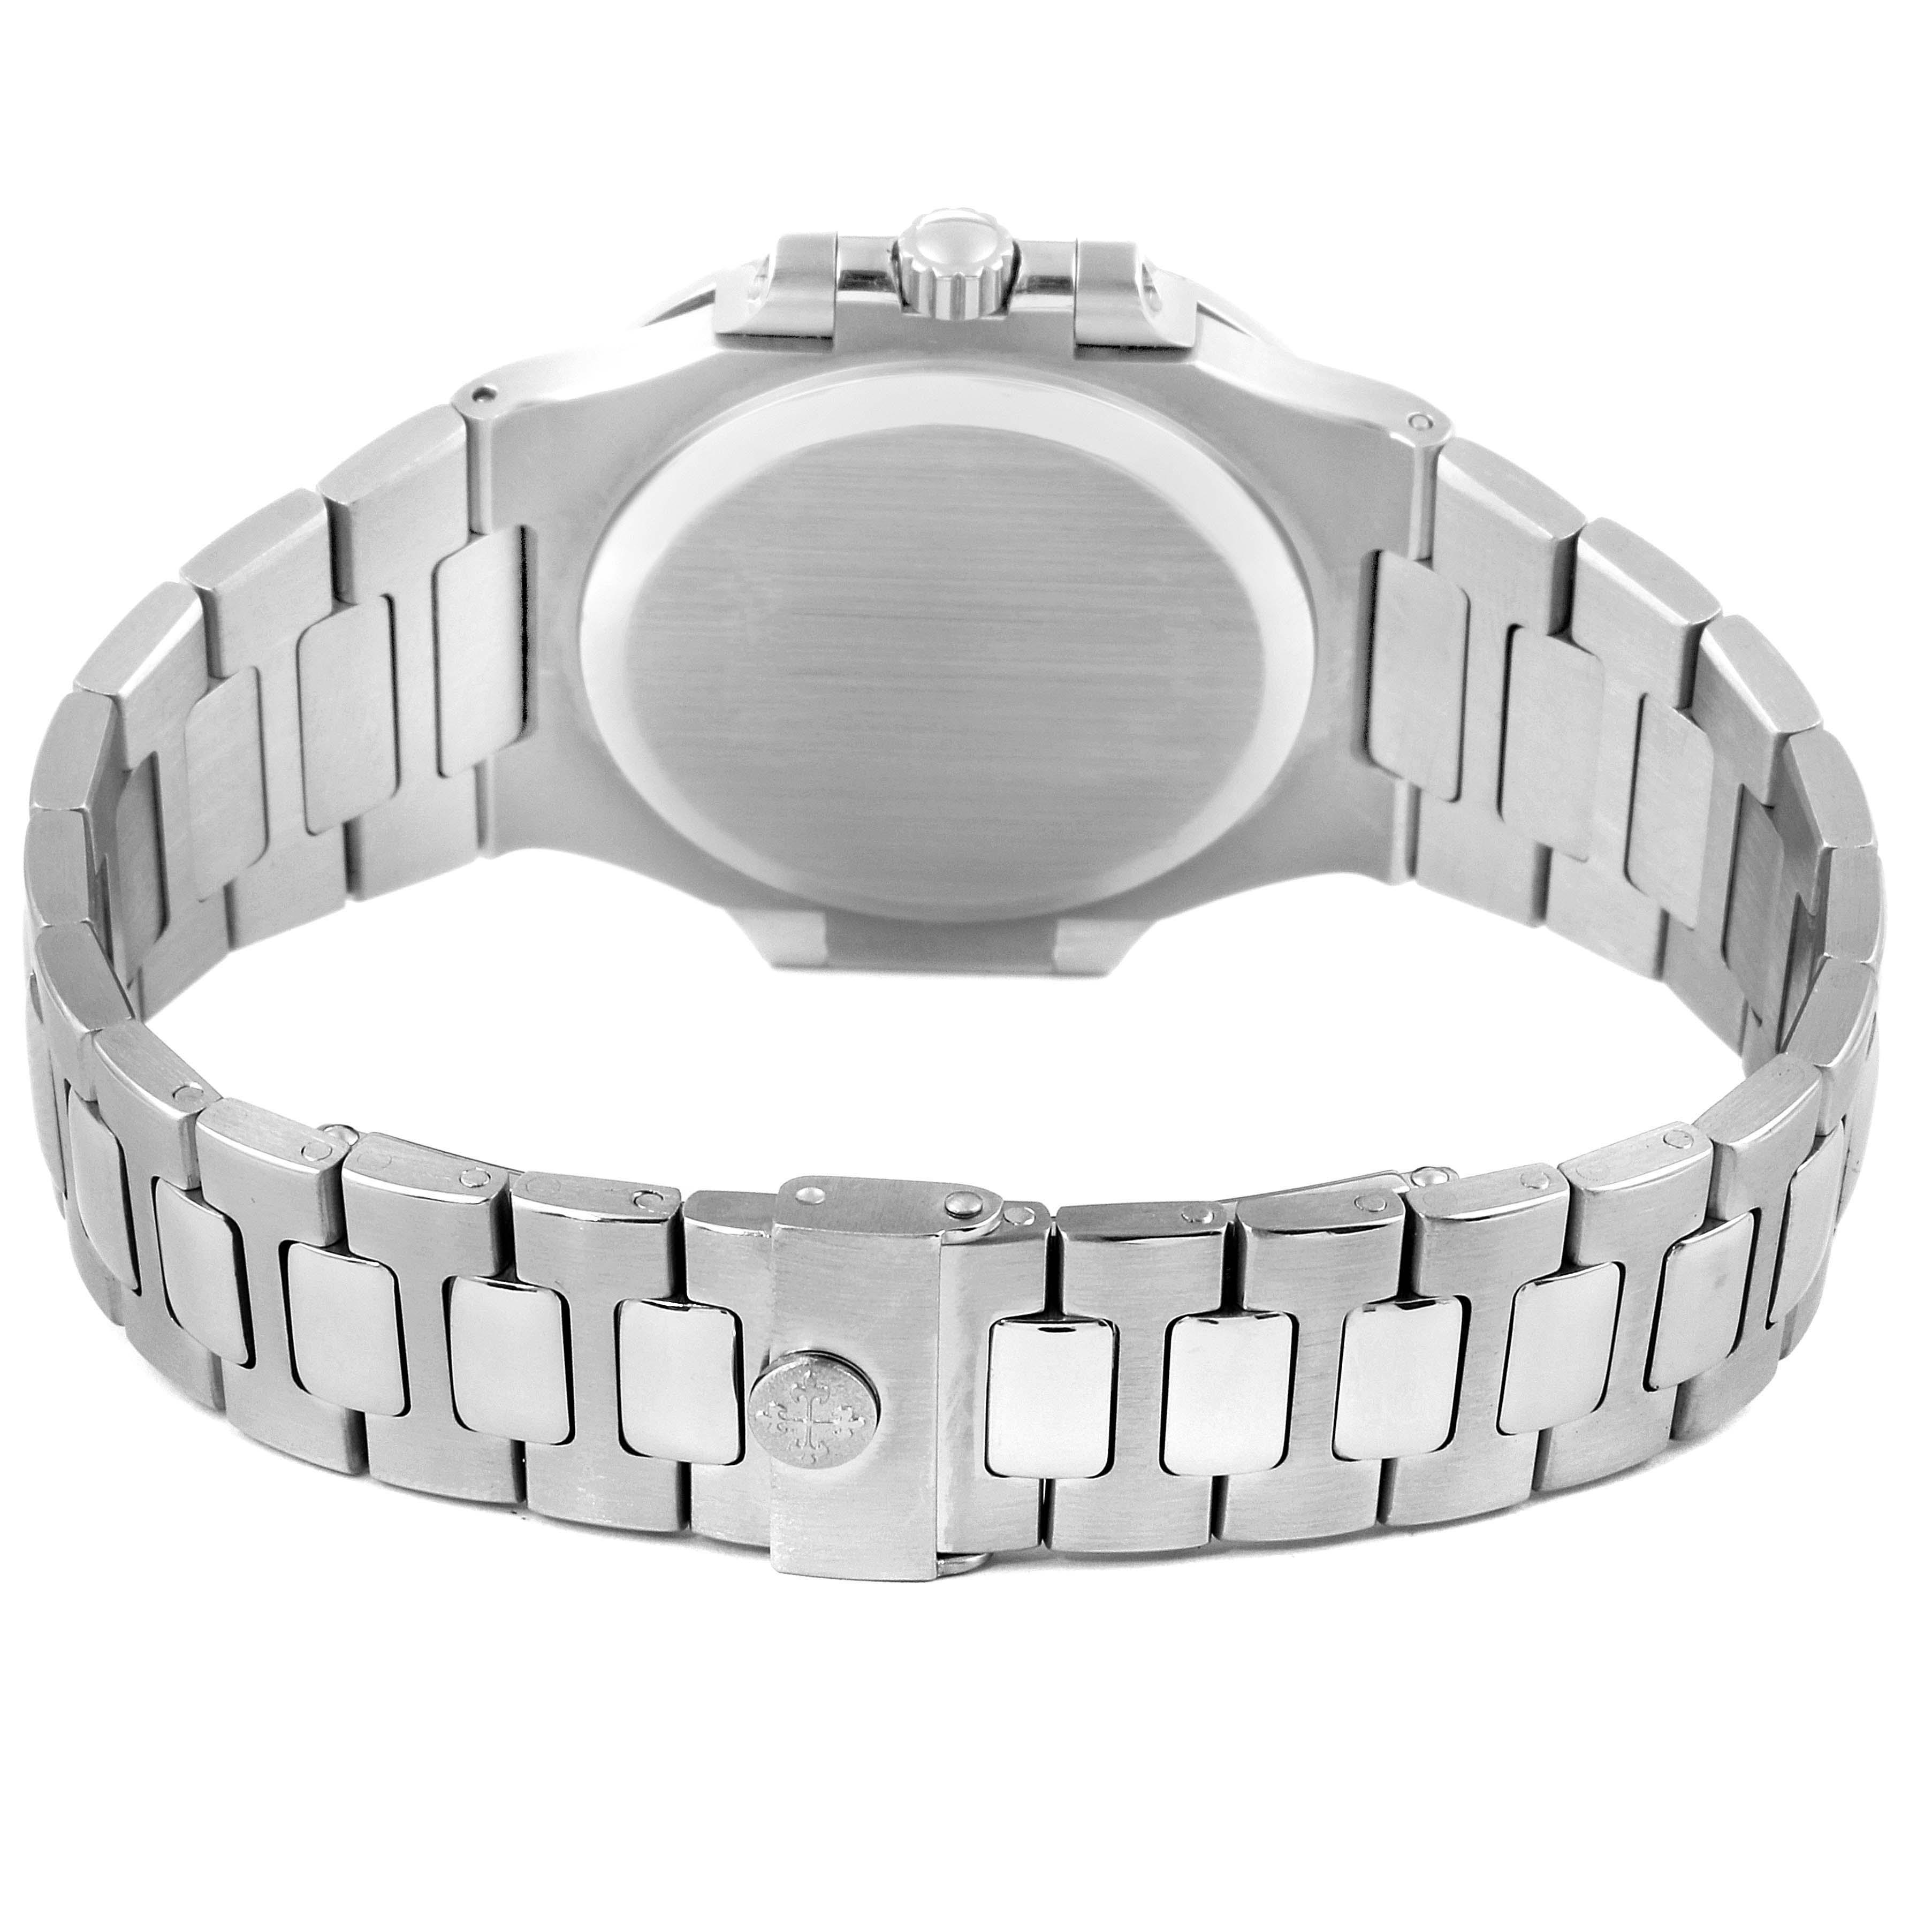 Patek Philippe Nautilus Black Dial Automatic Steel Mens Watch 3800 Papers SwissWatchExpo